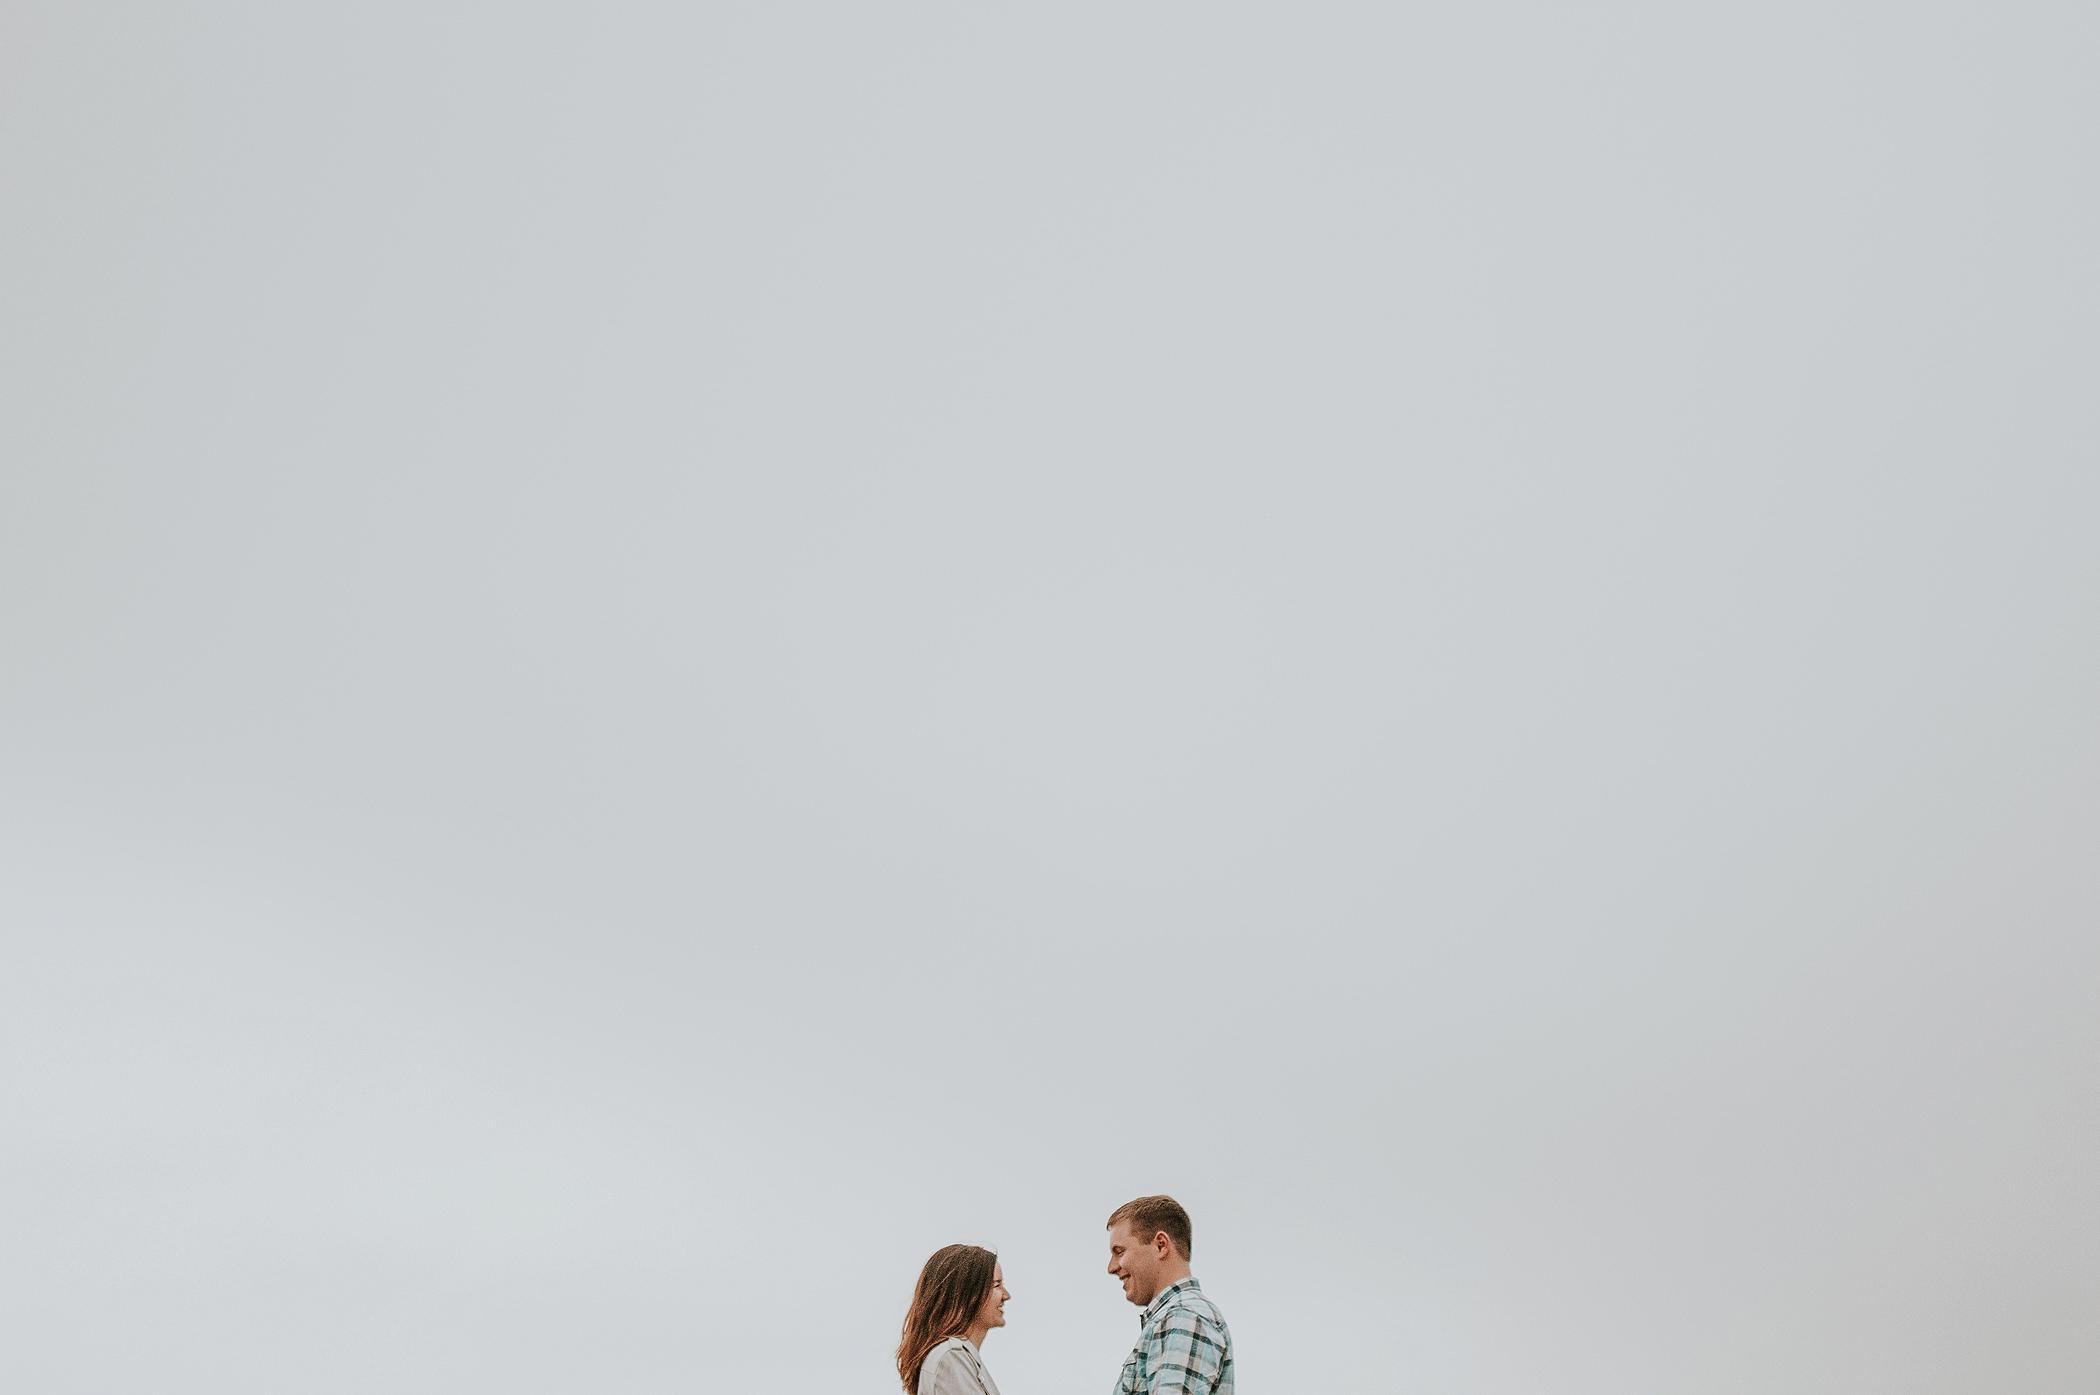 kaylie-sirek-nebraska-wedding-engagement-photographer-photography-grand-island-kearney-hastings-lincoln-47.png